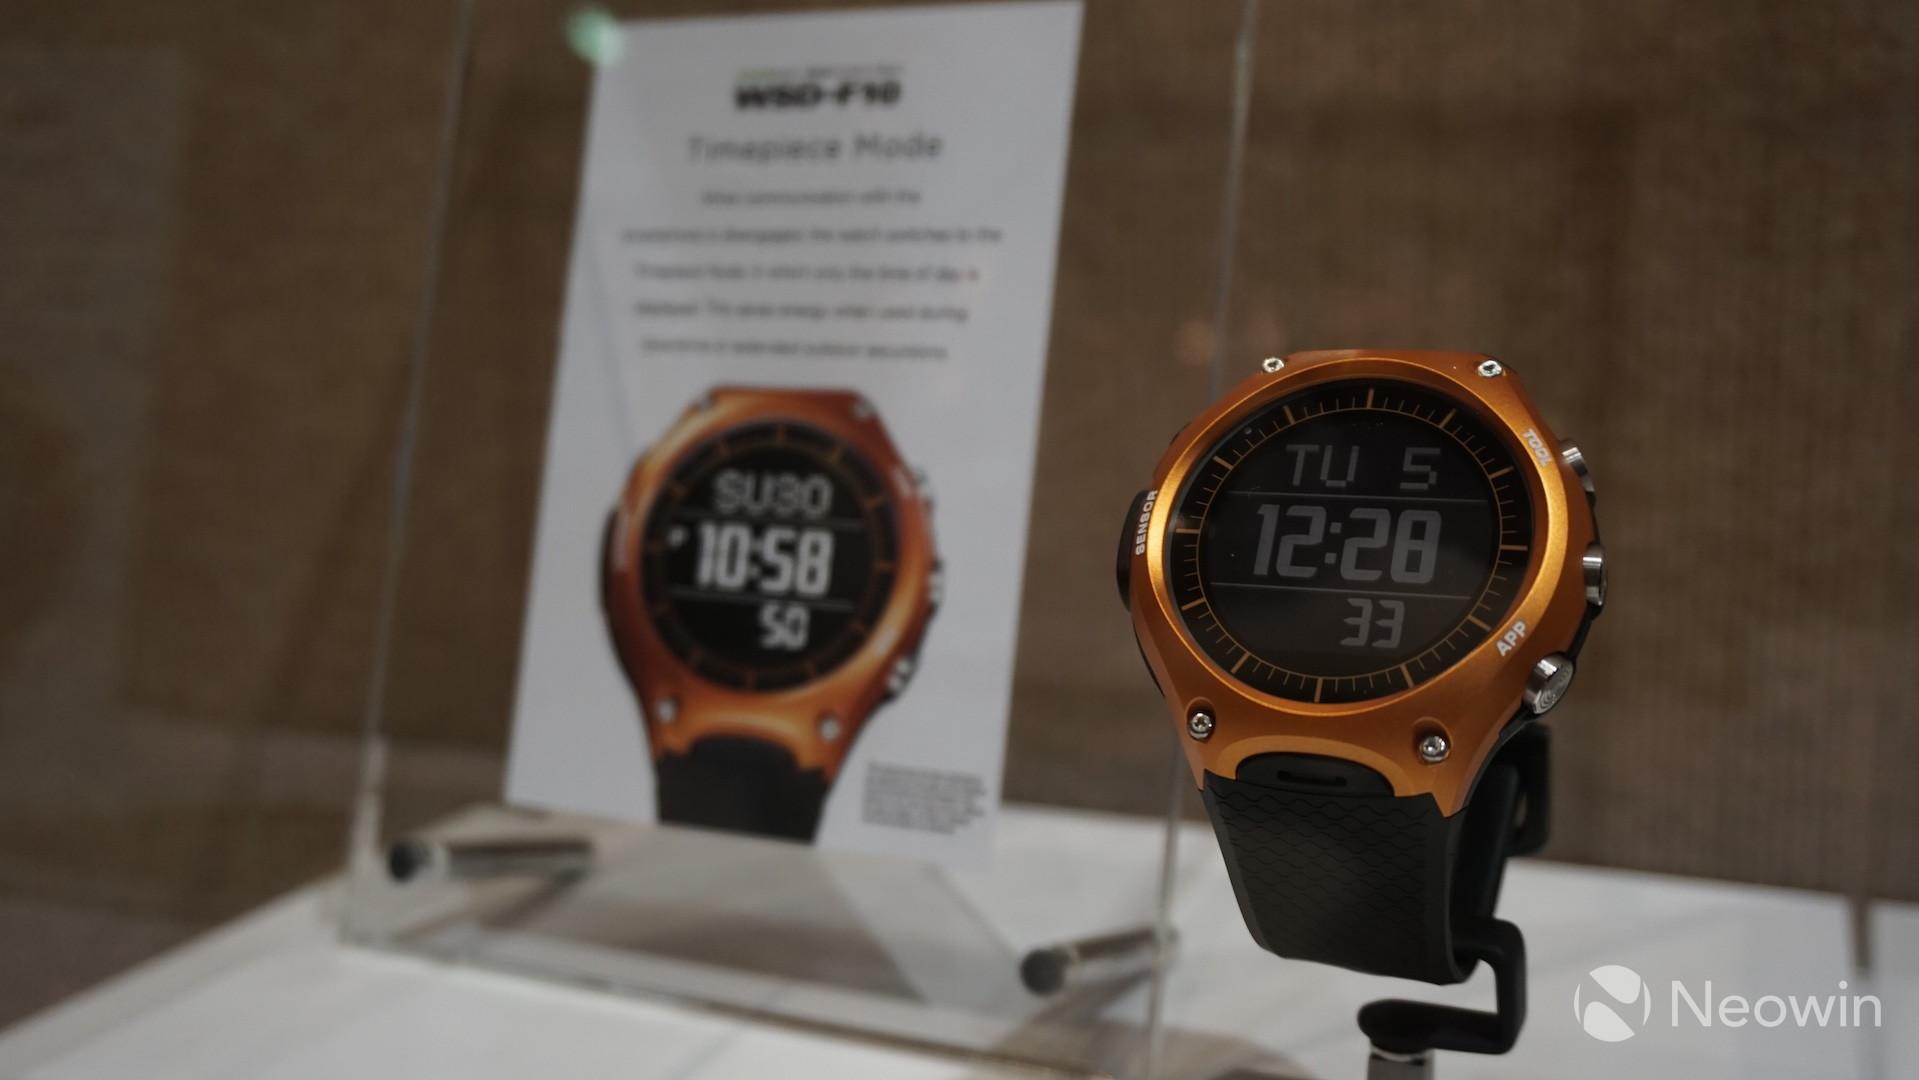 price smartwatch specs and rugged watch waterproof rug snopow best